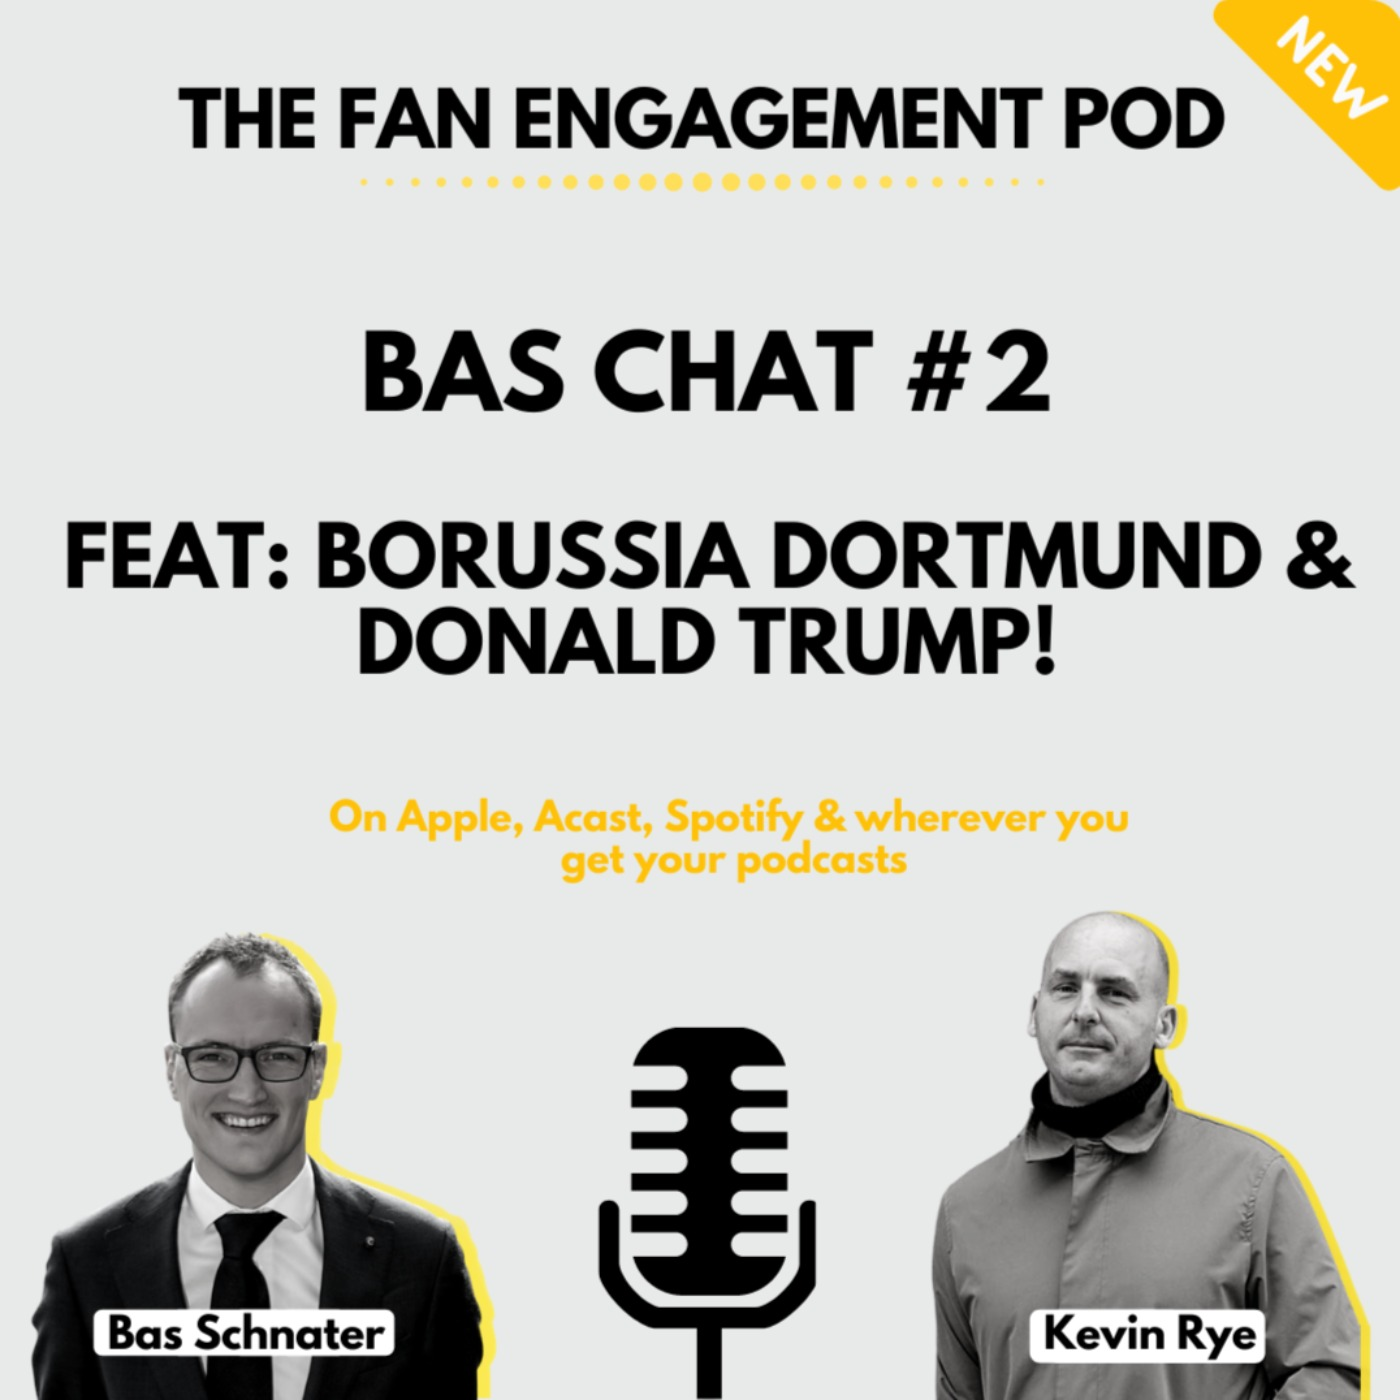 Trump & Borussia Dortmund? It's Bas Chat #2